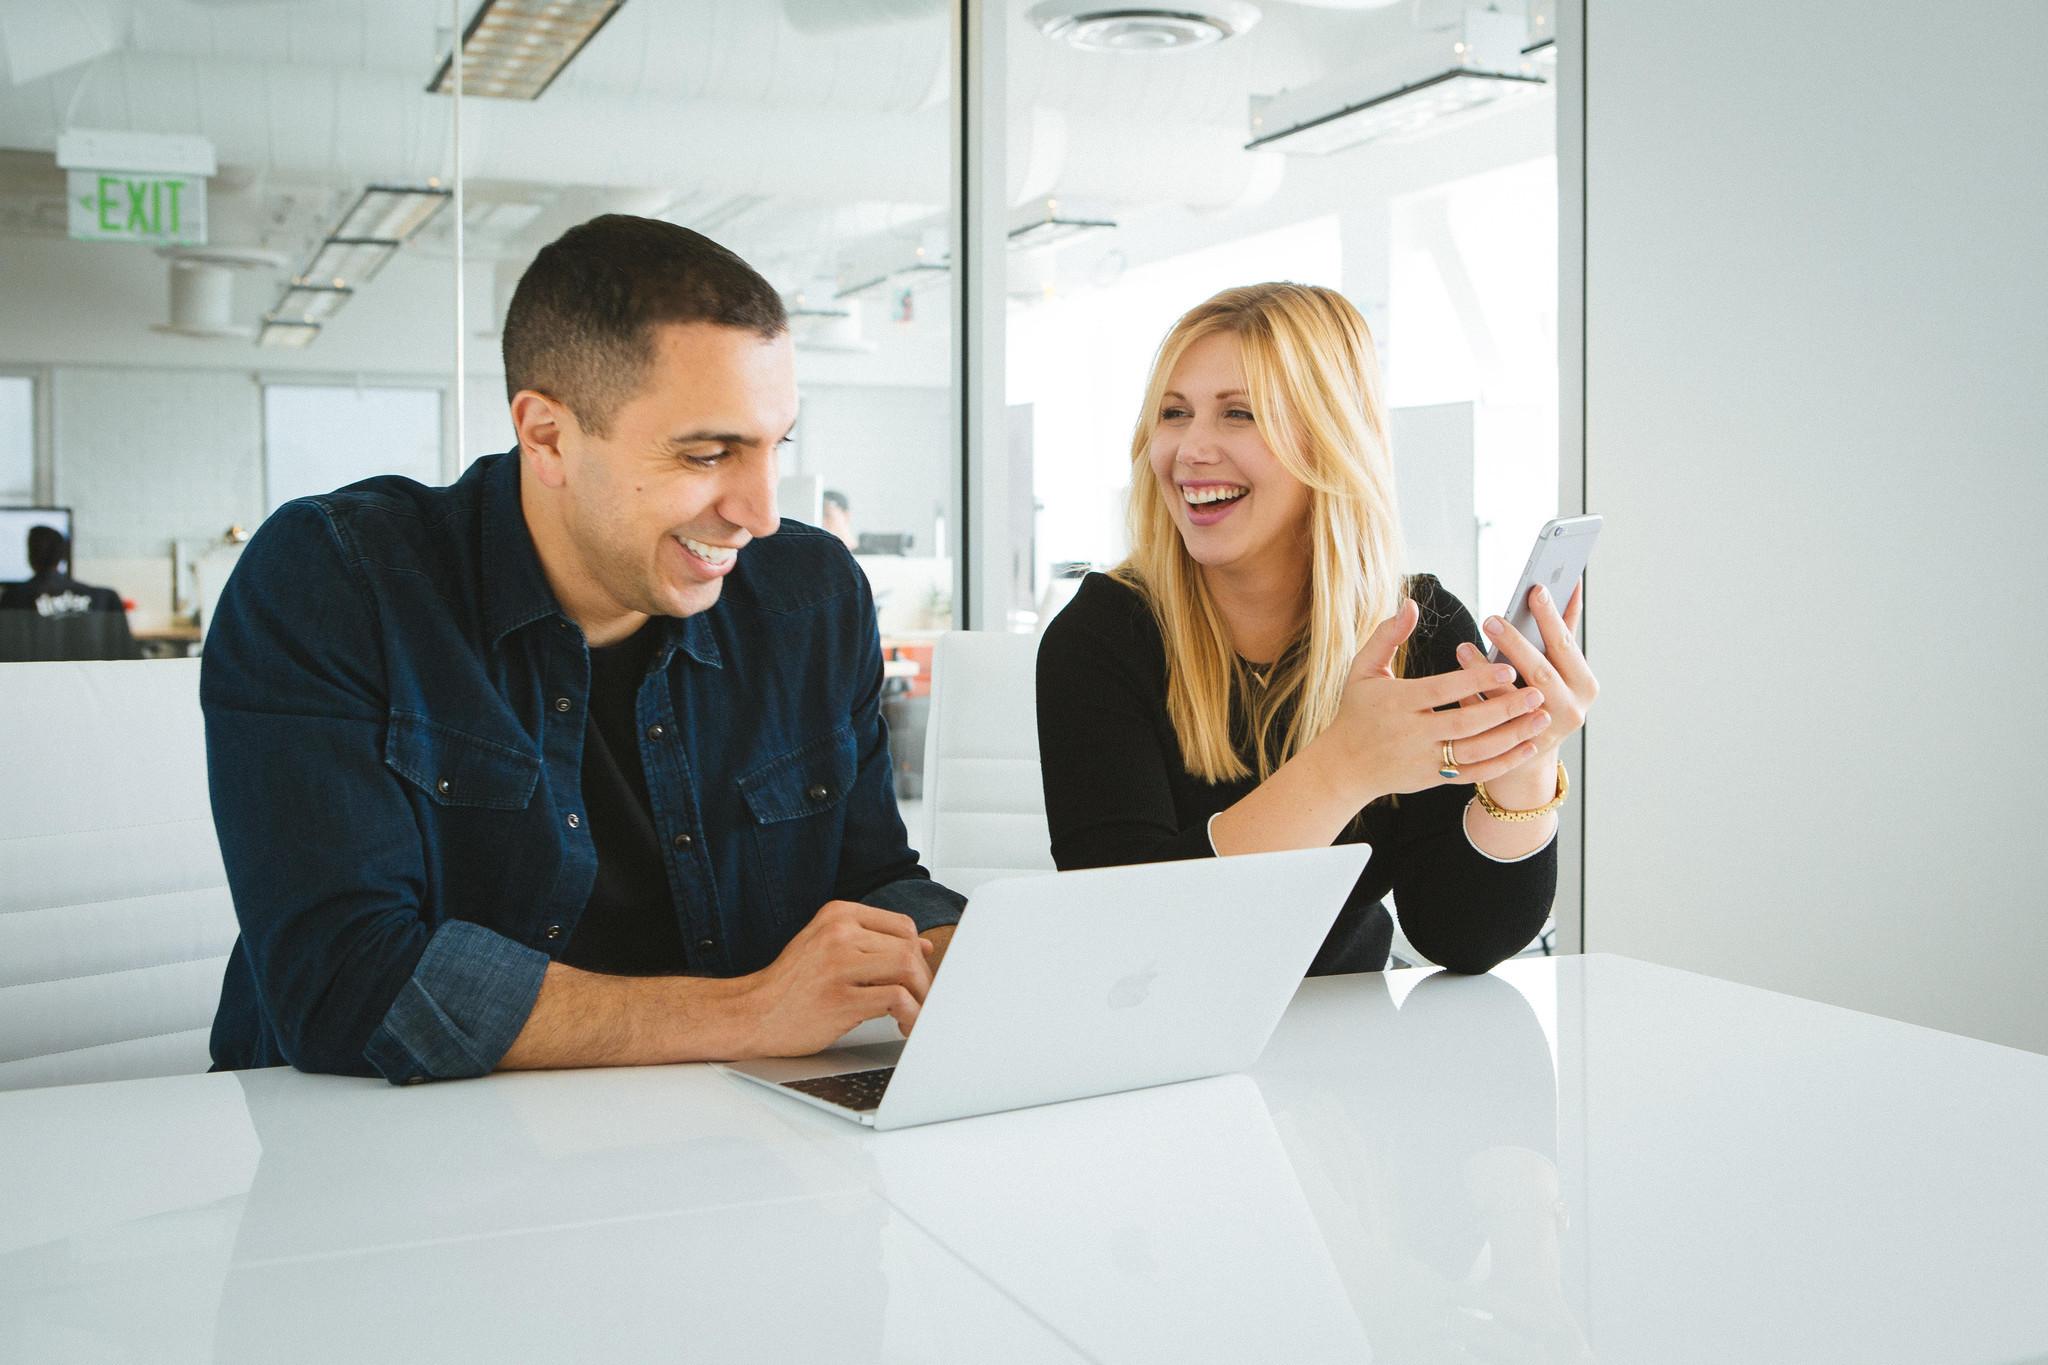 Tinder Chief Executive Sean Rad and Vina founder Olivia June Poole.